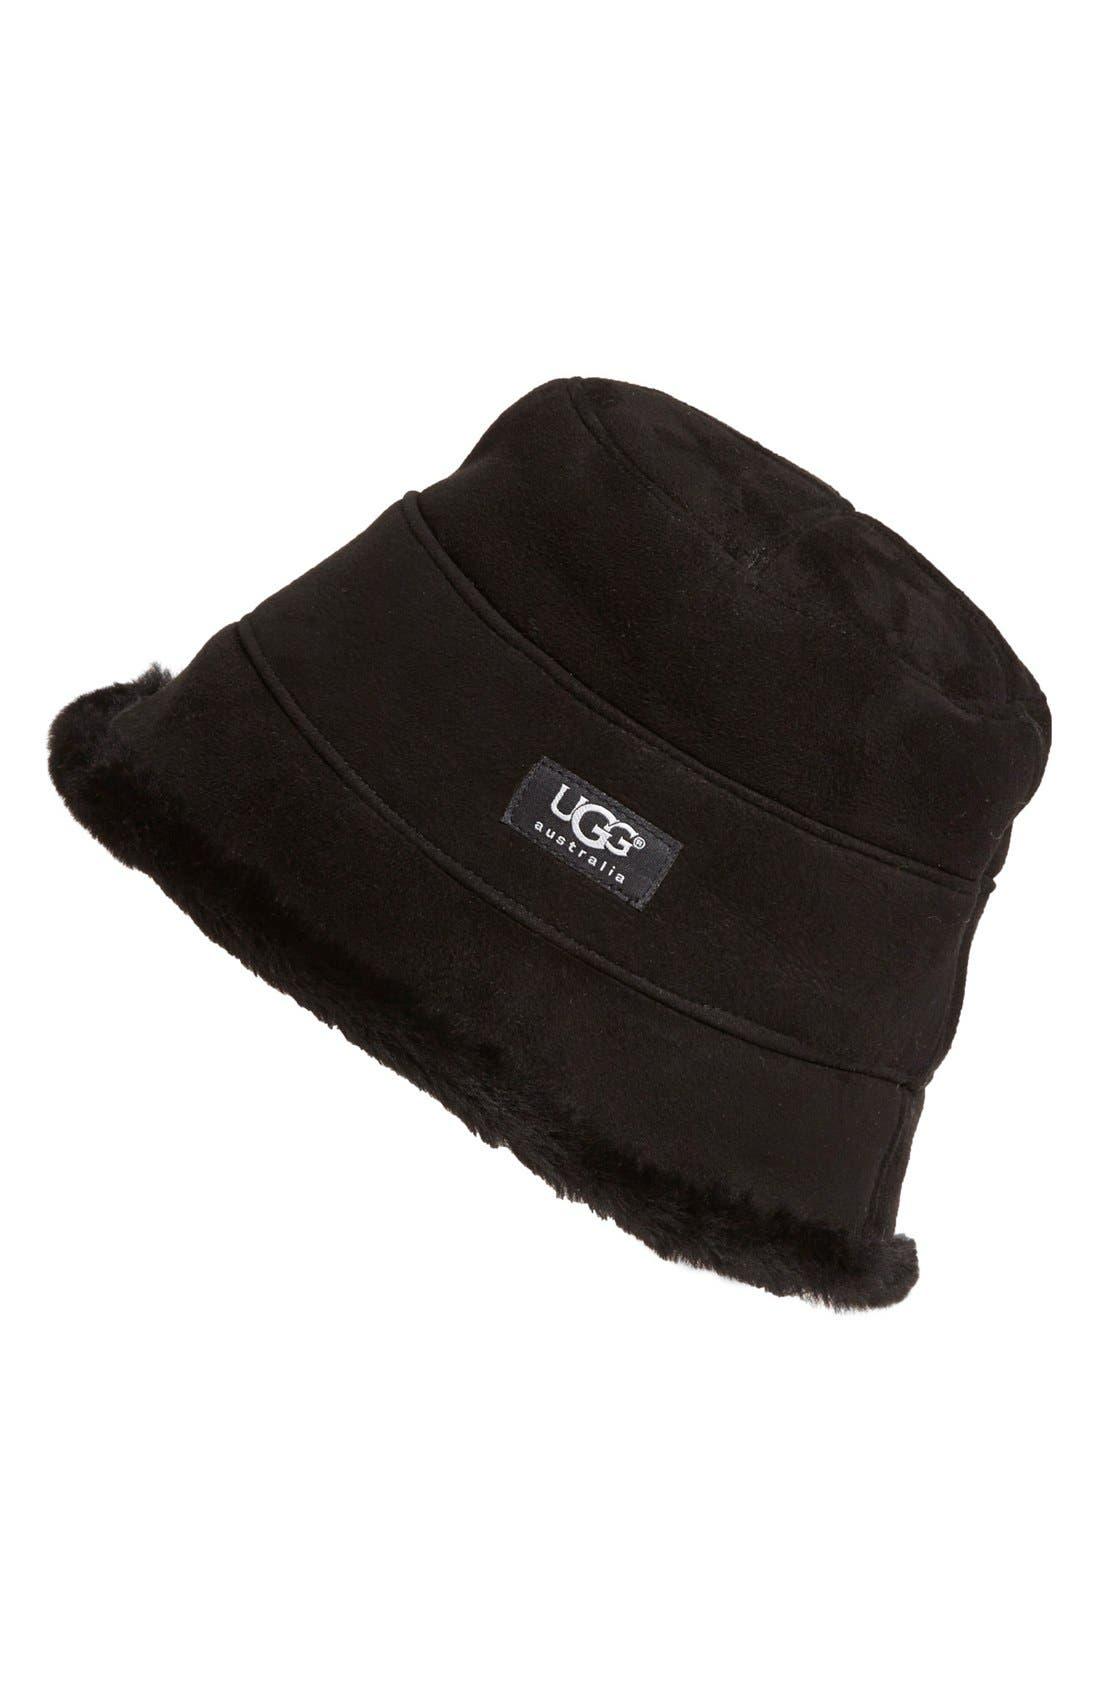 Main Image - UGG® Australia 'City' Genuine Shearling Bucket Hat